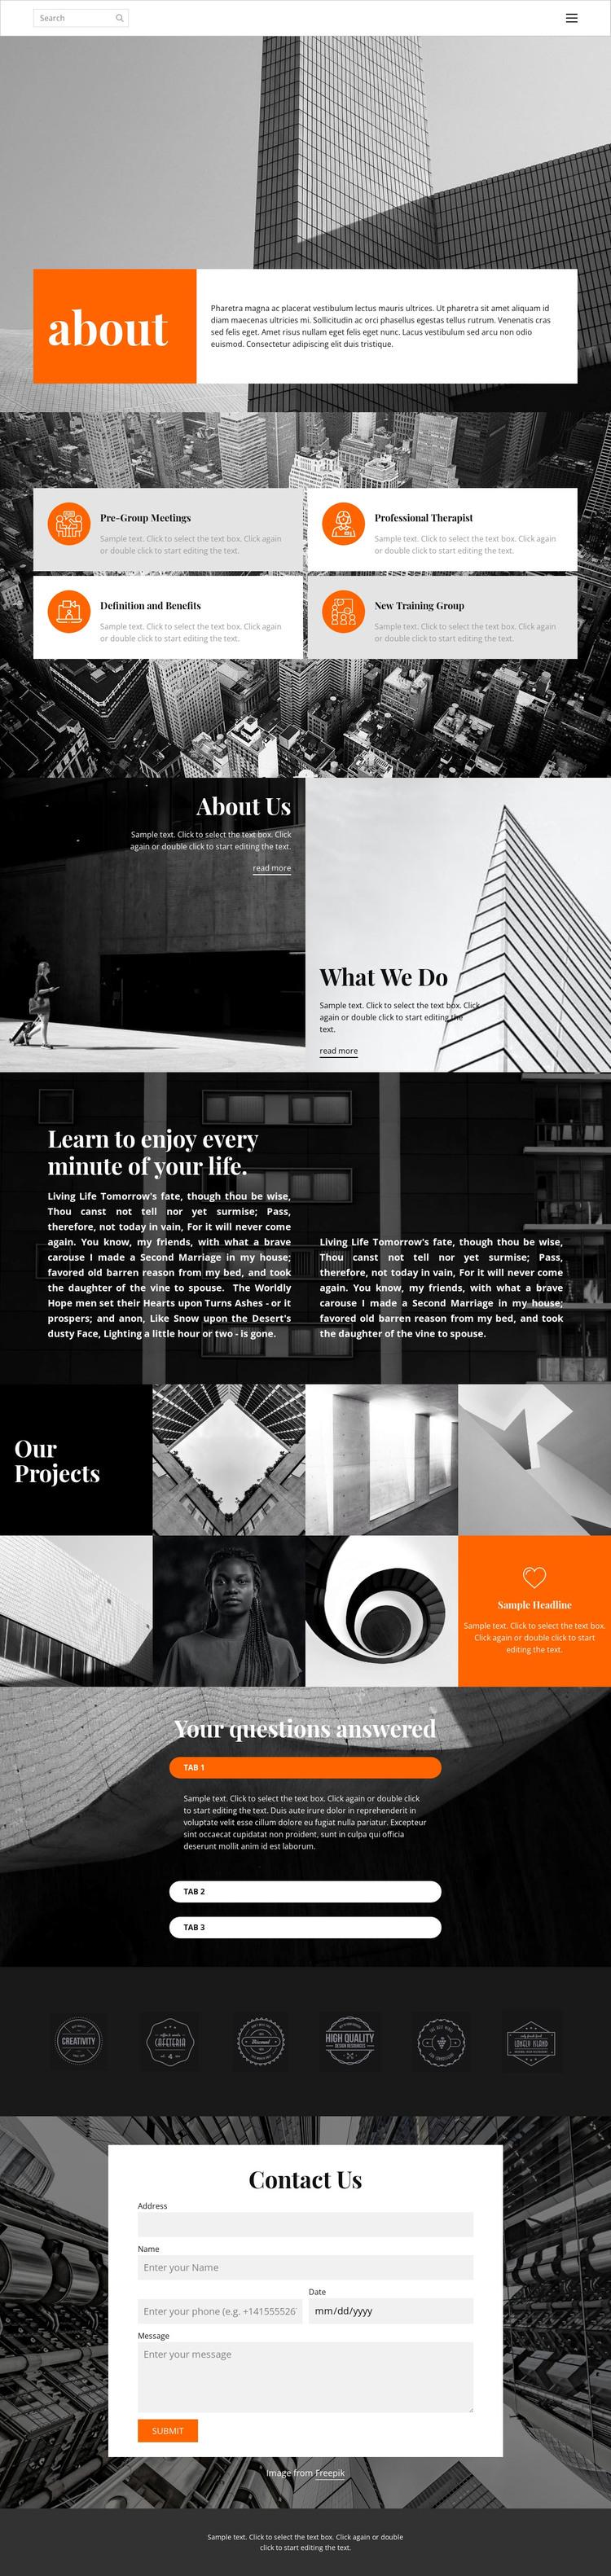 New projects studio WordPress Theme